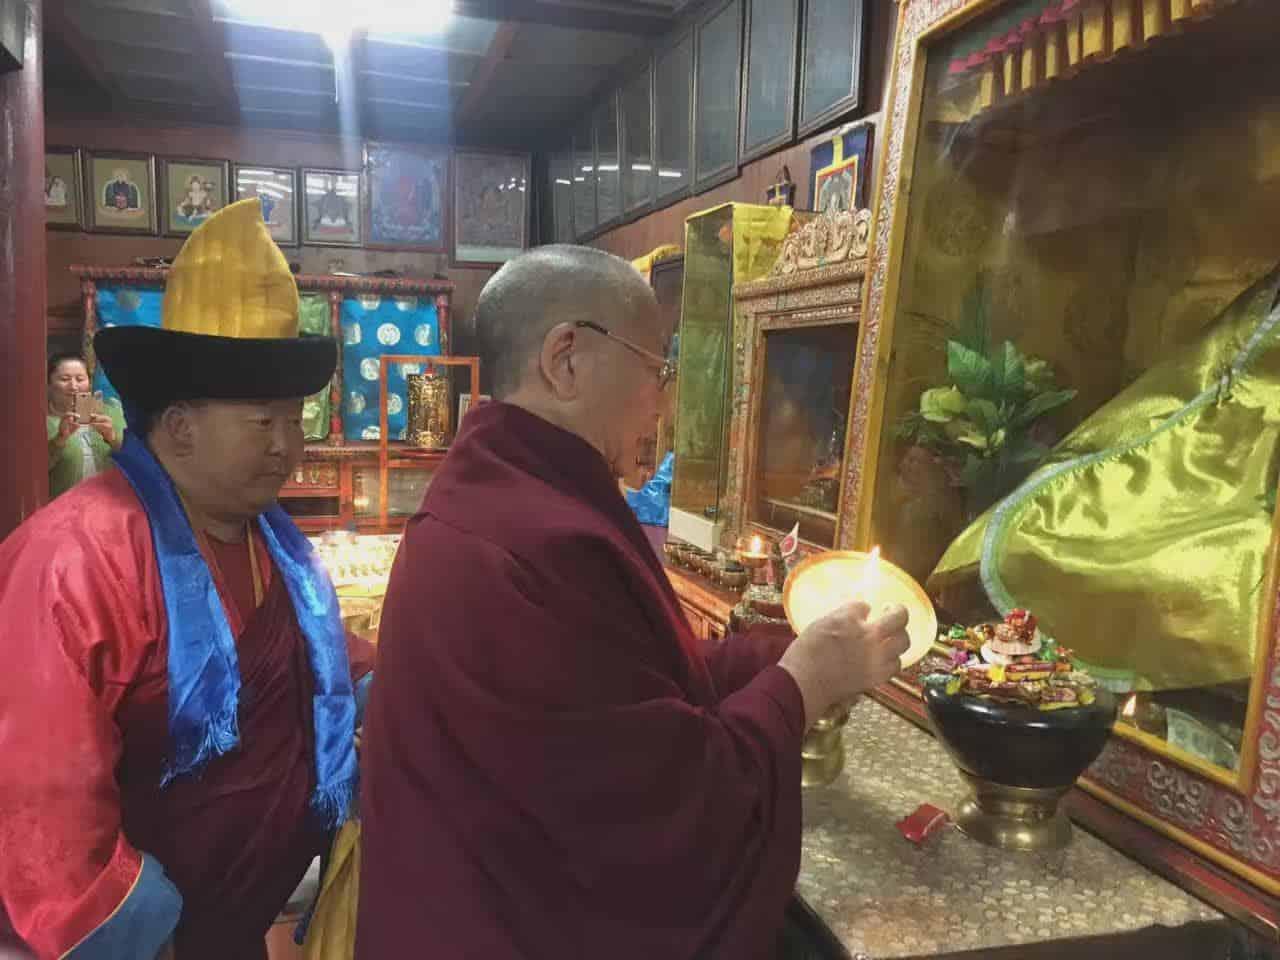 gosok-rinpoche-mongolia-2016-f74e0151caea2a500fd407757574d10